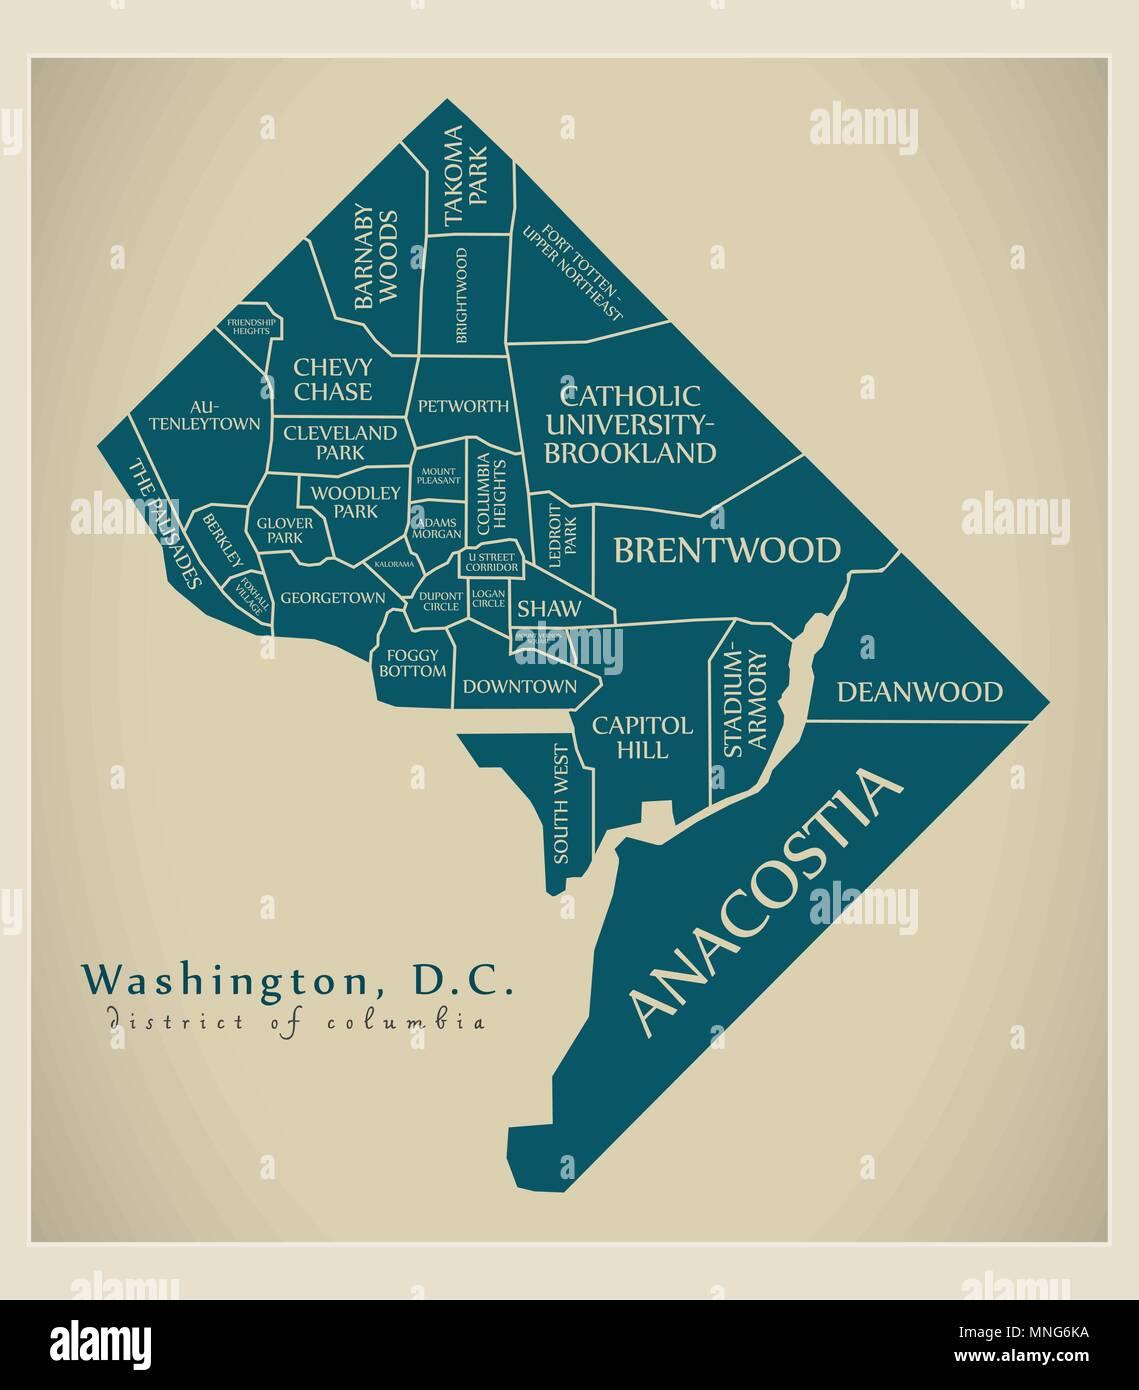 Modern City Map - Washington DC city of the USA with neighborhoods on